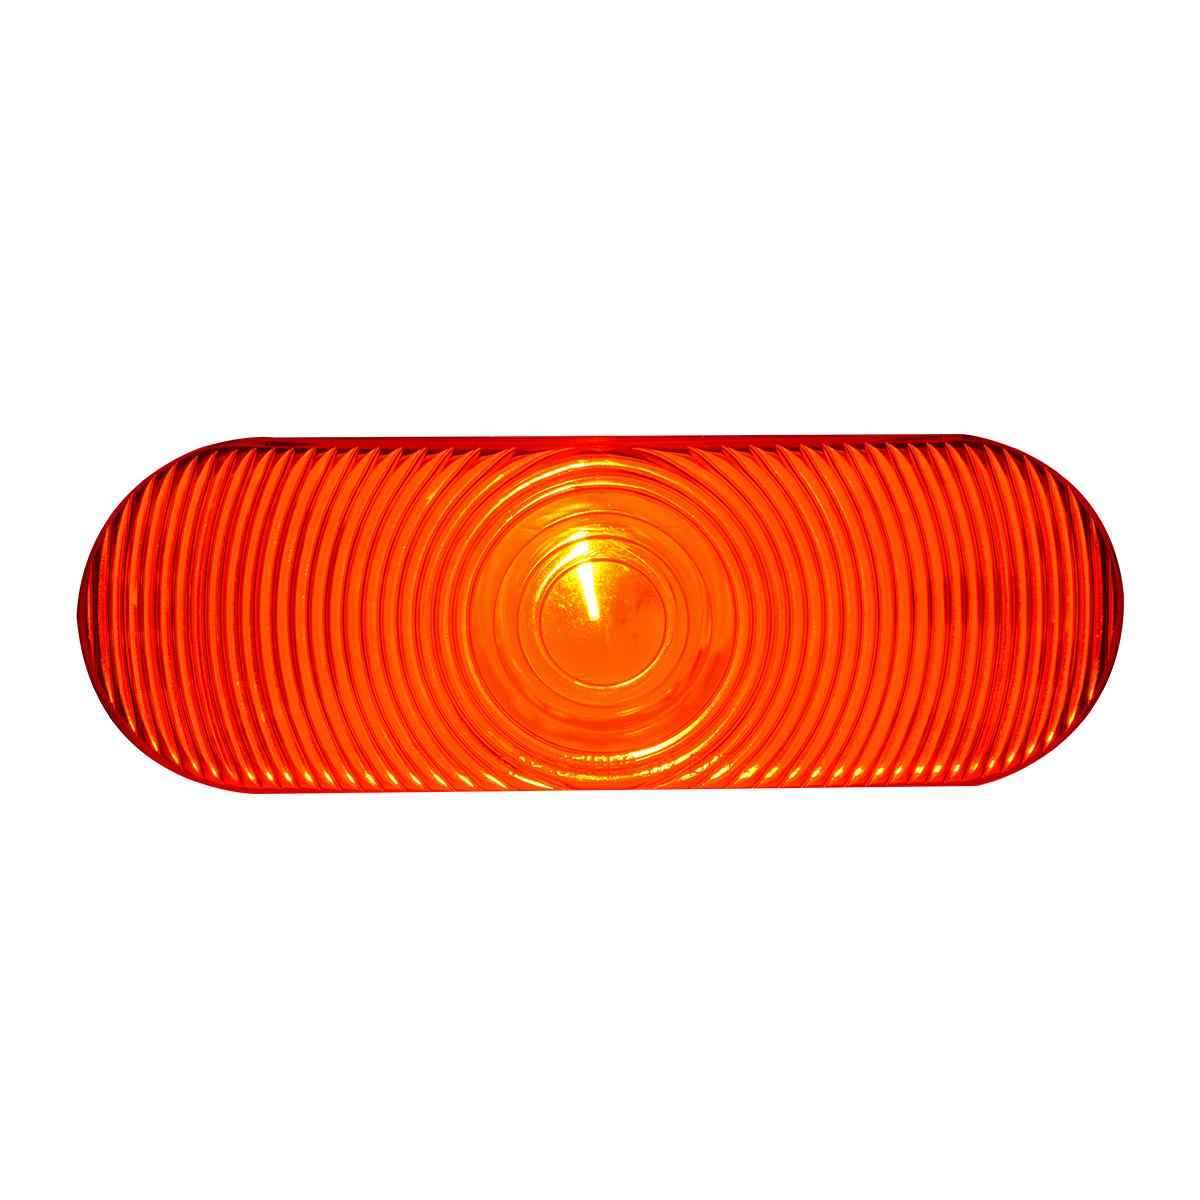 #80805 - Oval Incandescent Flat Red/Red Light - Slanted